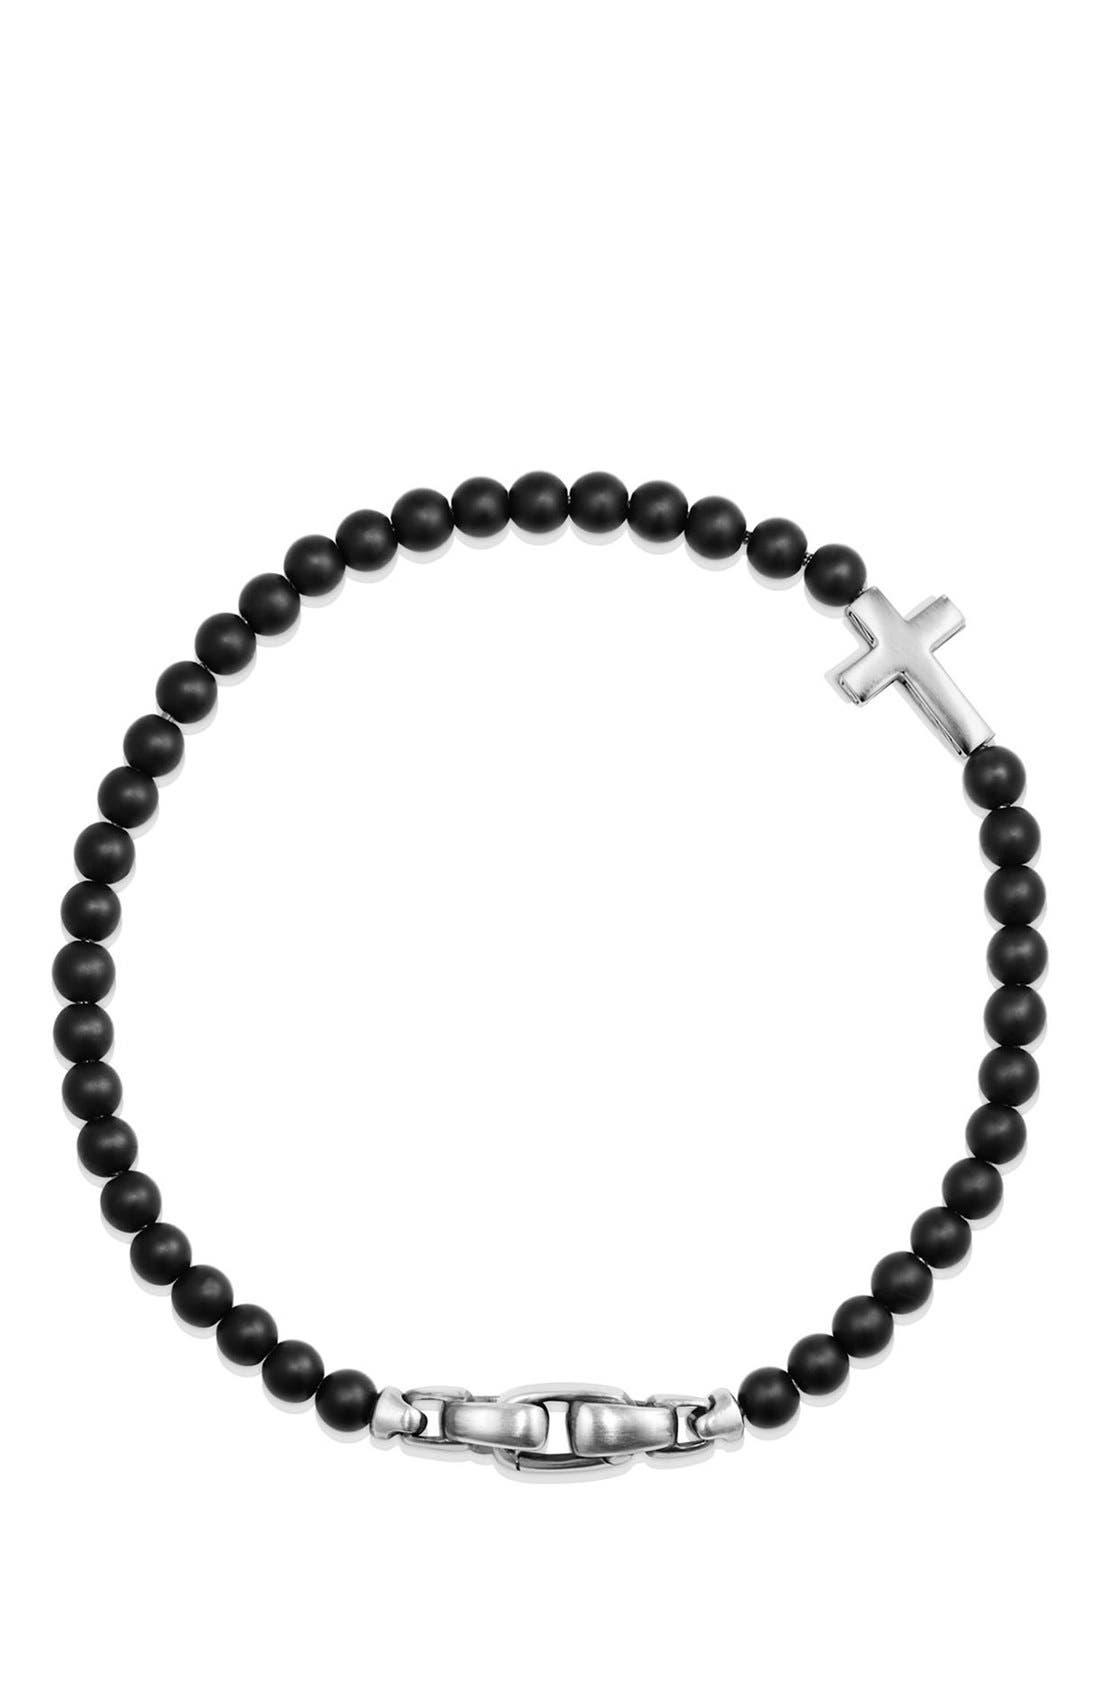 'Spiritual Beads' Cross Bead Bracelet with Semiprecious Stones,                             Alternate thumbnail 3, color,                             SILVER/ BLACK ONYX